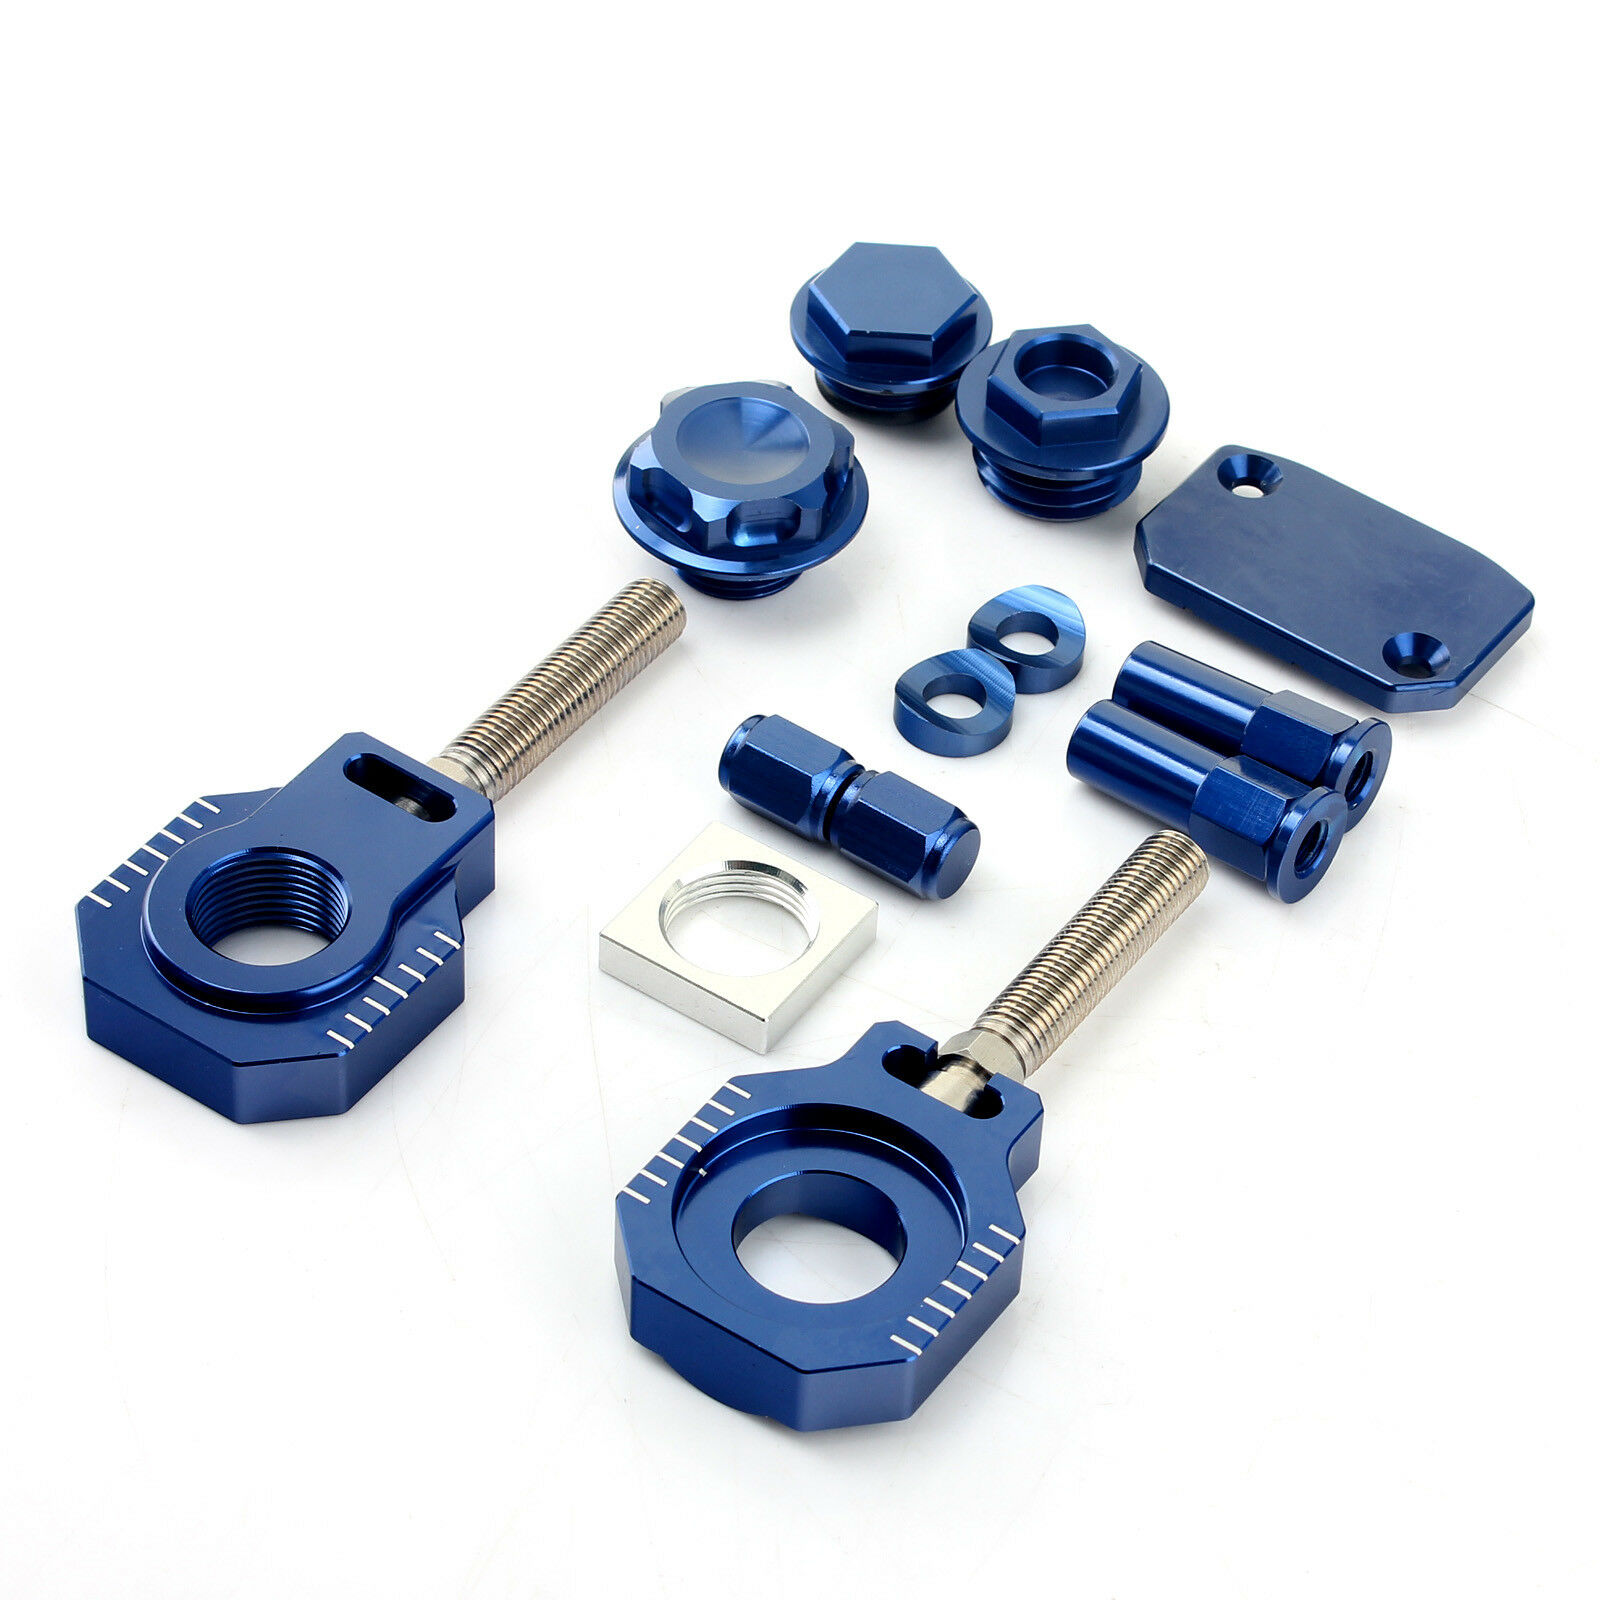 For Suzuki MX Offroad Bling Kits RMZ 250 RM-Z 250 07-16 RMZ 450 05-16 15 14 Blue